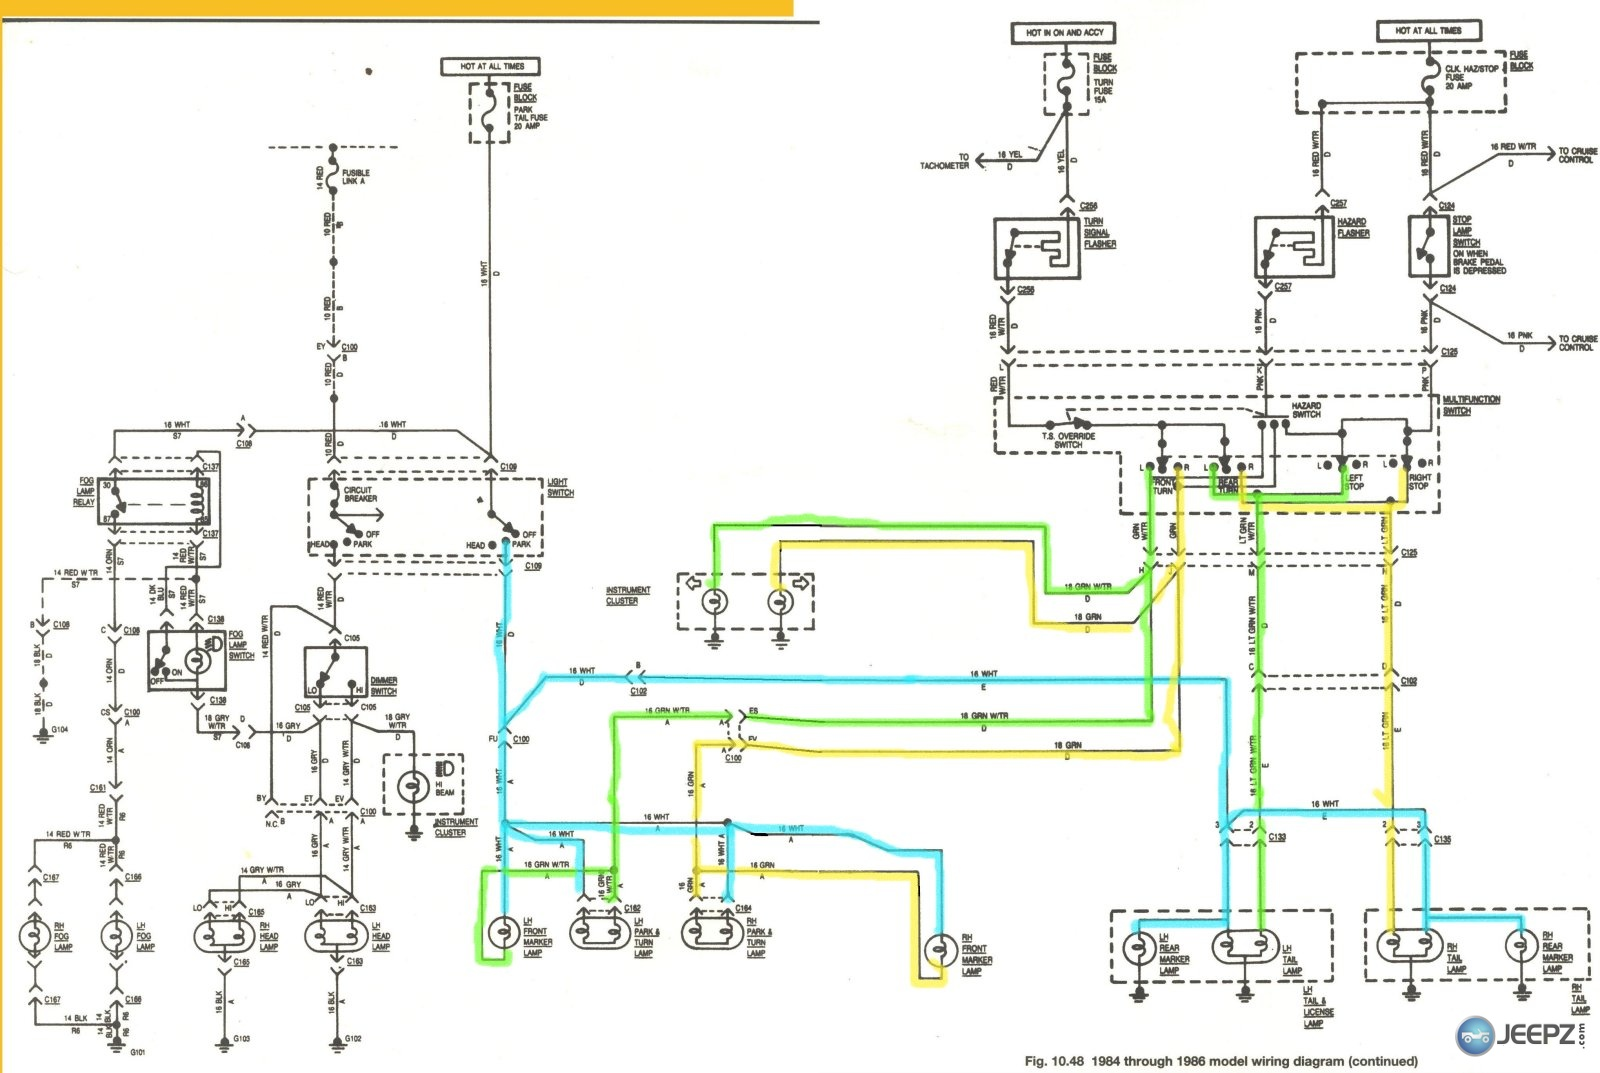 jeep cj7 headlight switch wiring - fender wiring diagram -  yjm308.tukune.jeanjaures37.fr  wiring diagram resource